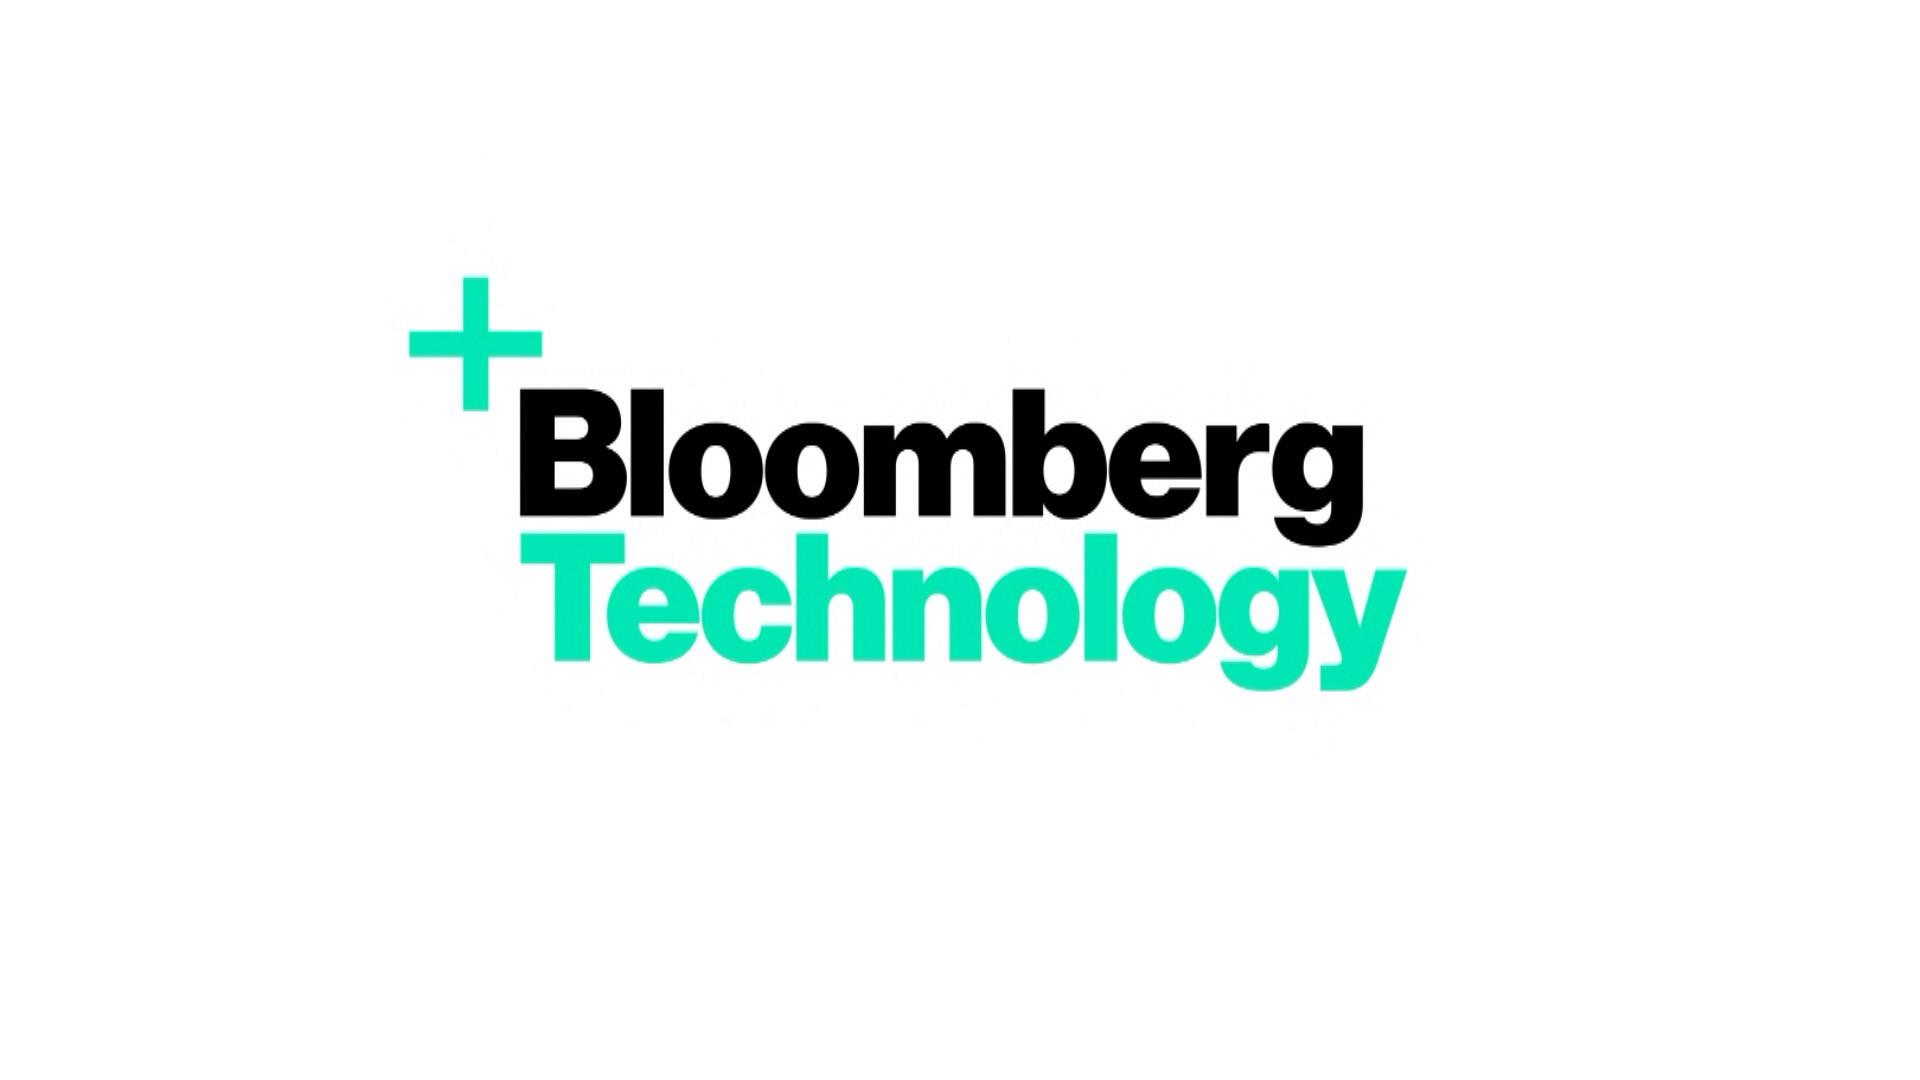 https://www bloomberg com/news/videos/2018-04-06/asian-trade